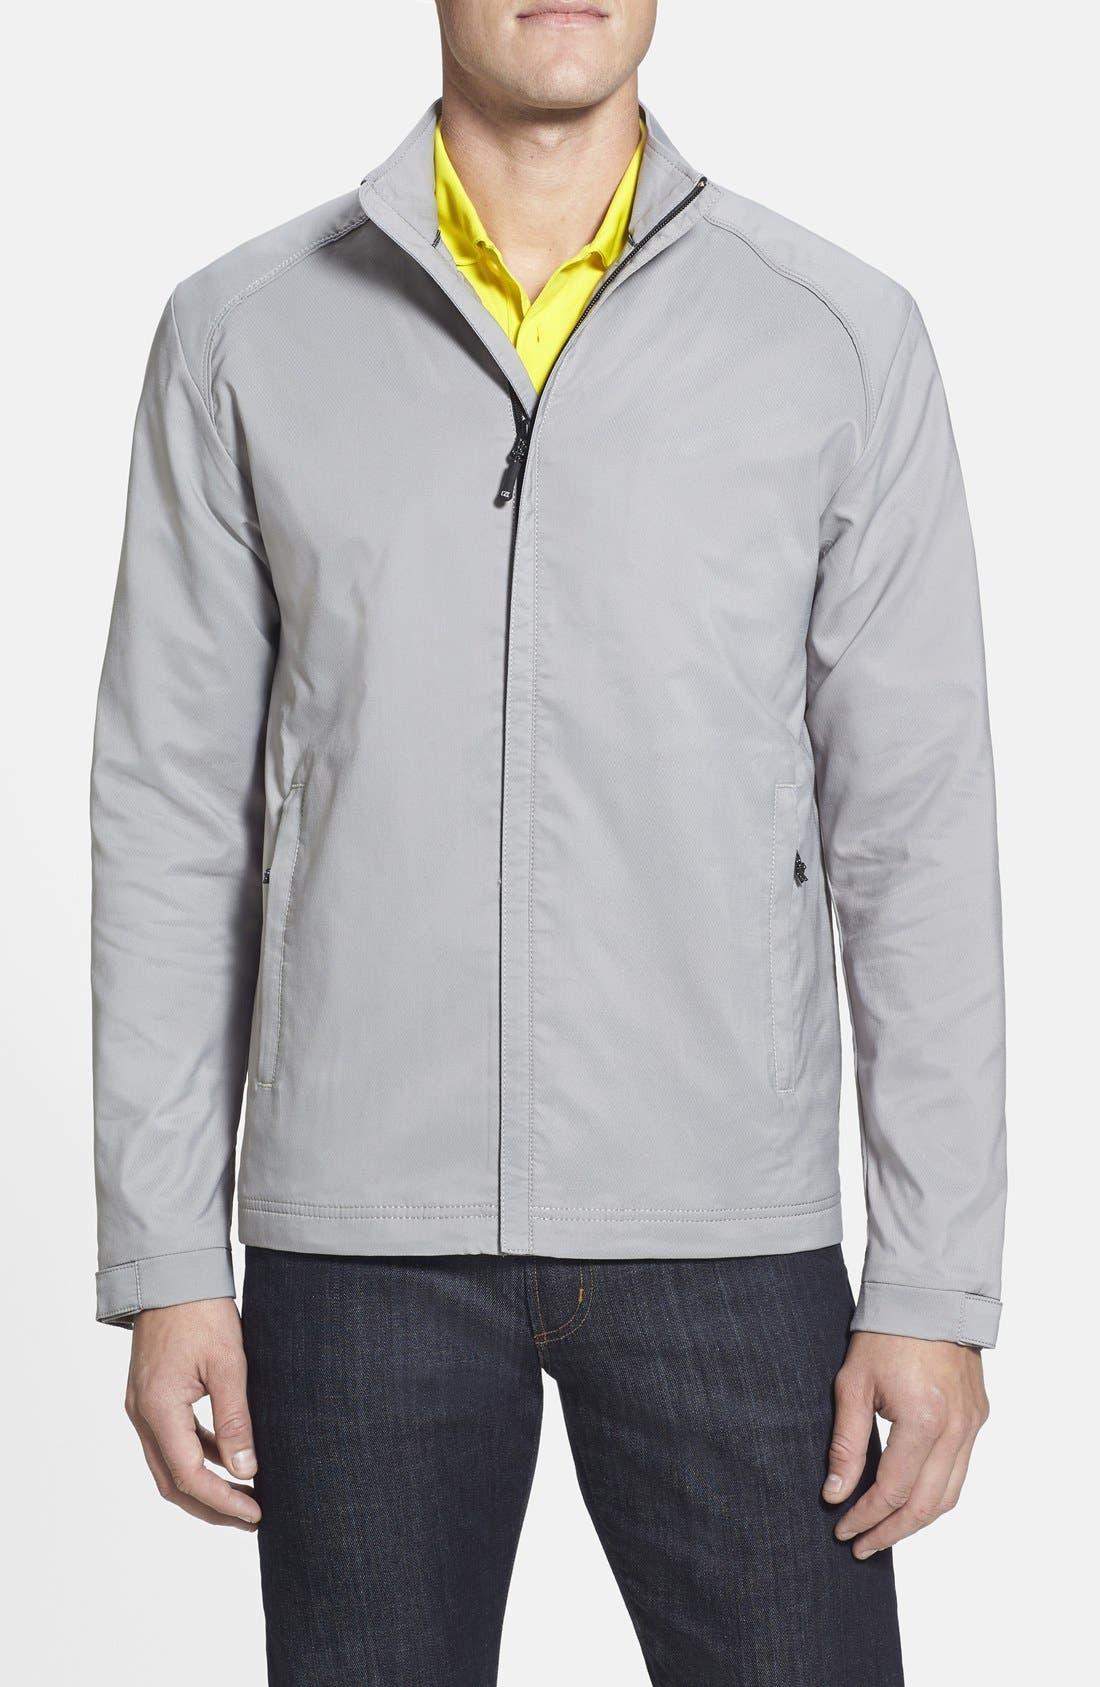 Cutter & Buck 'Blakely' WeatherTec® Wind & Water Resistant Full Zip Jacket